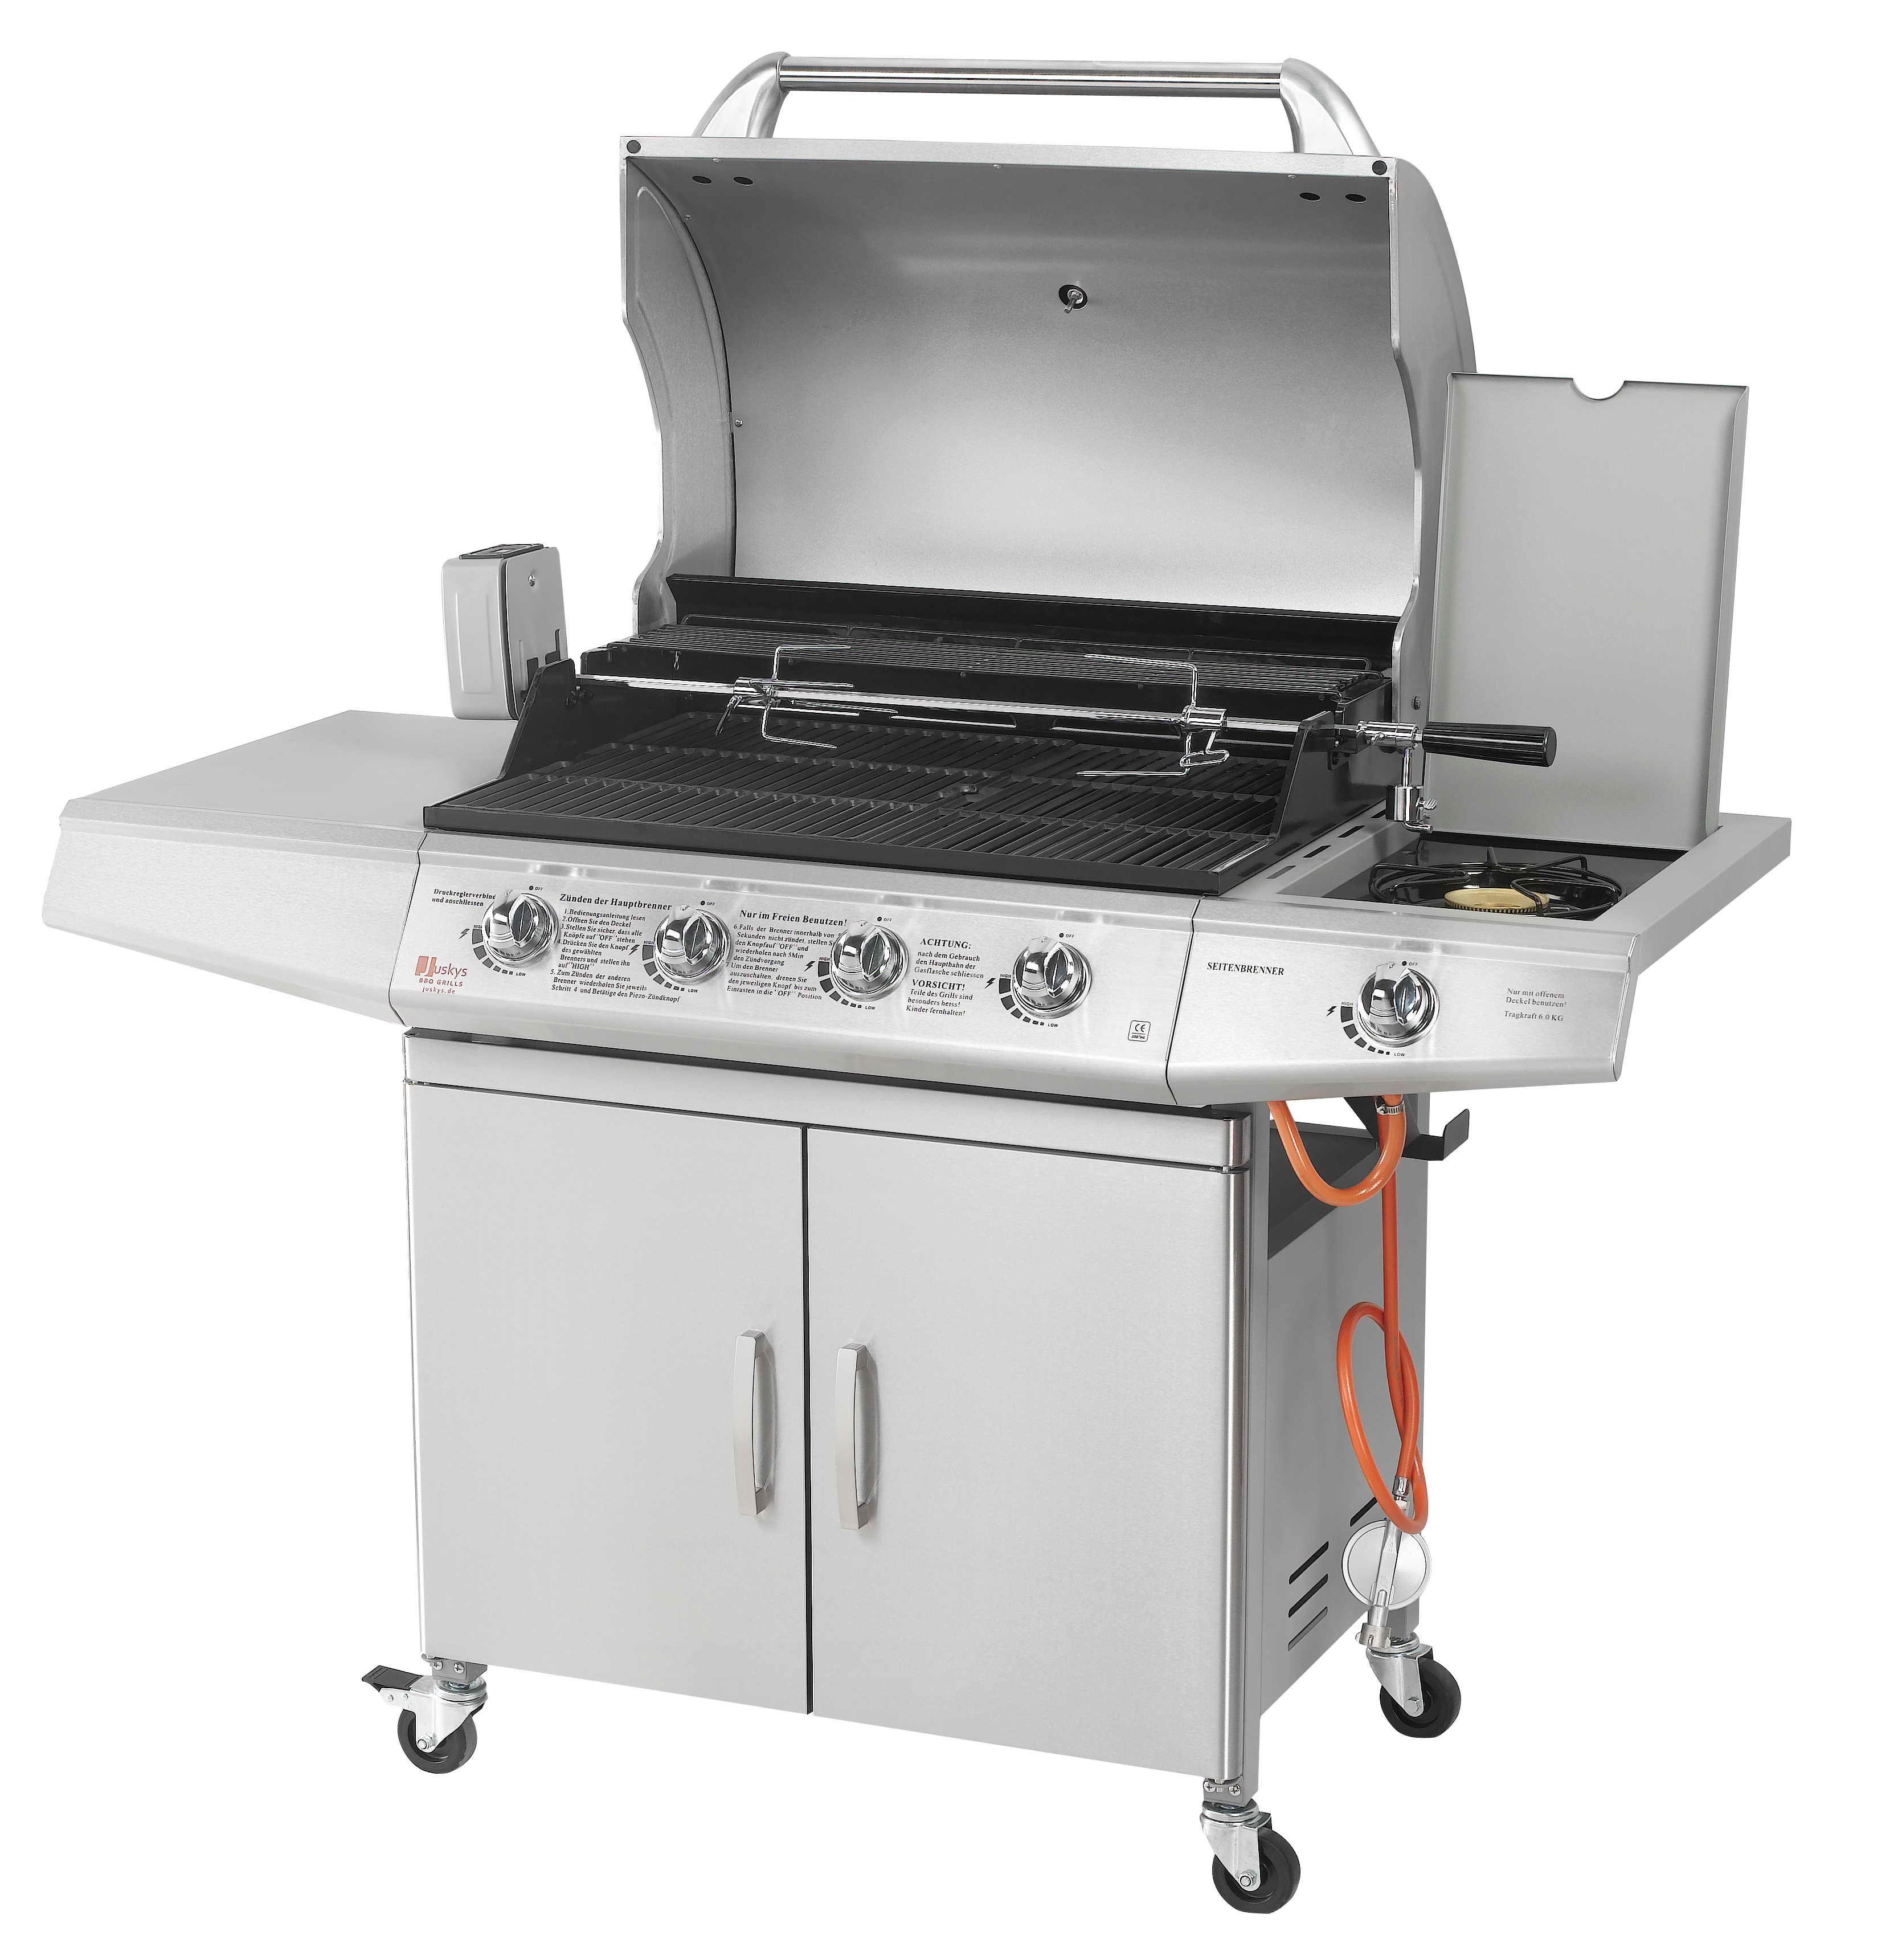 bbq gasgrill grillwagen edelstahl gas brenner barbecue gartengrill broilcue ebay. Black Bedroom Furniture Sets. Home Design Ideas